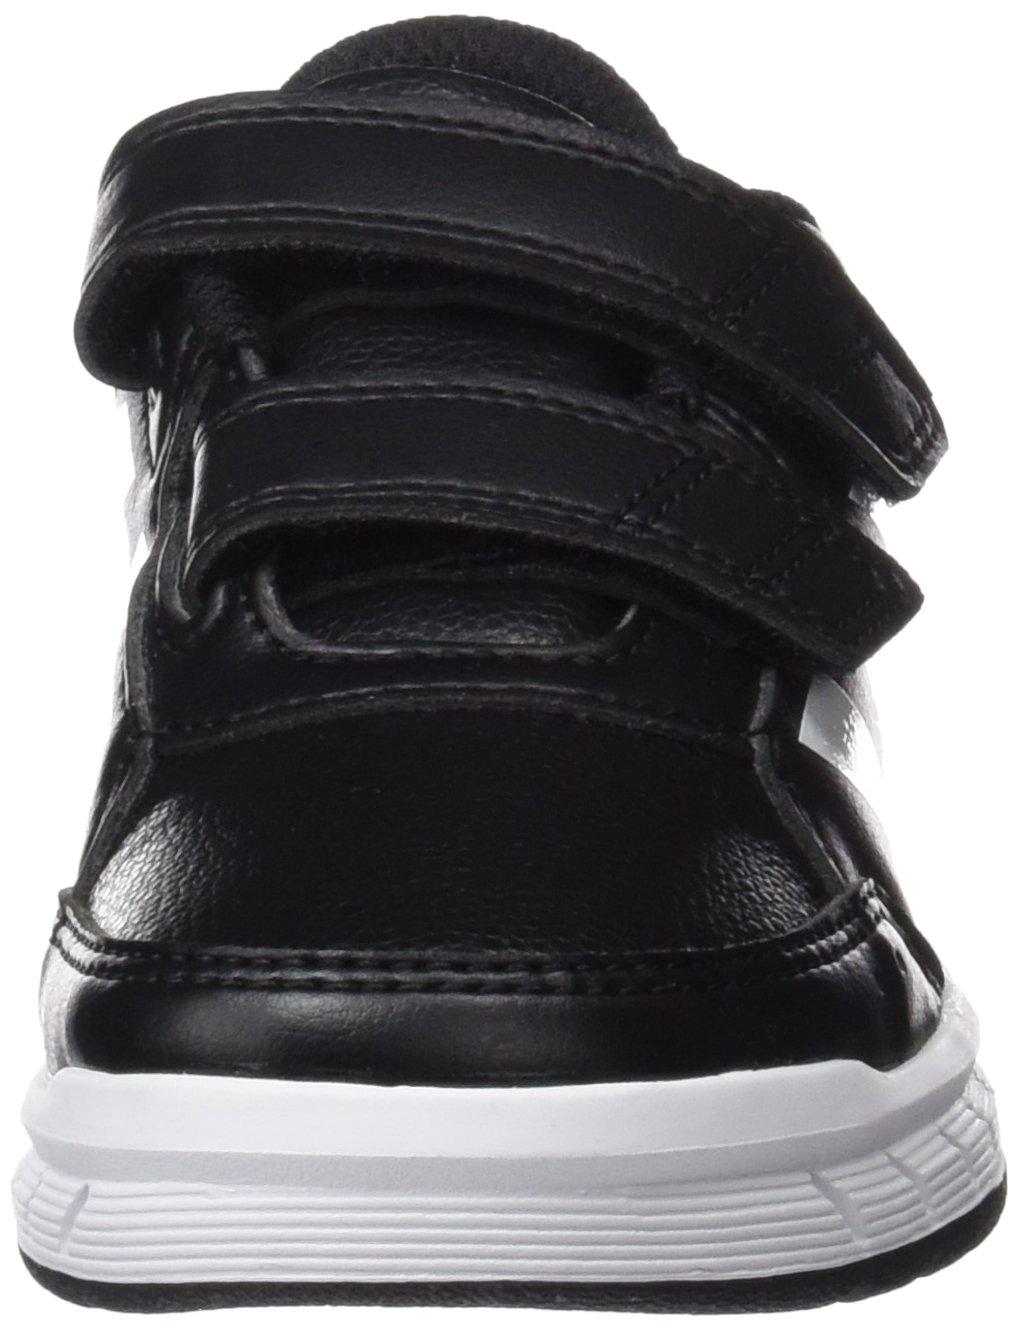 Chaussures de Fitness Mixte Enfant adidas AltaSport CF K